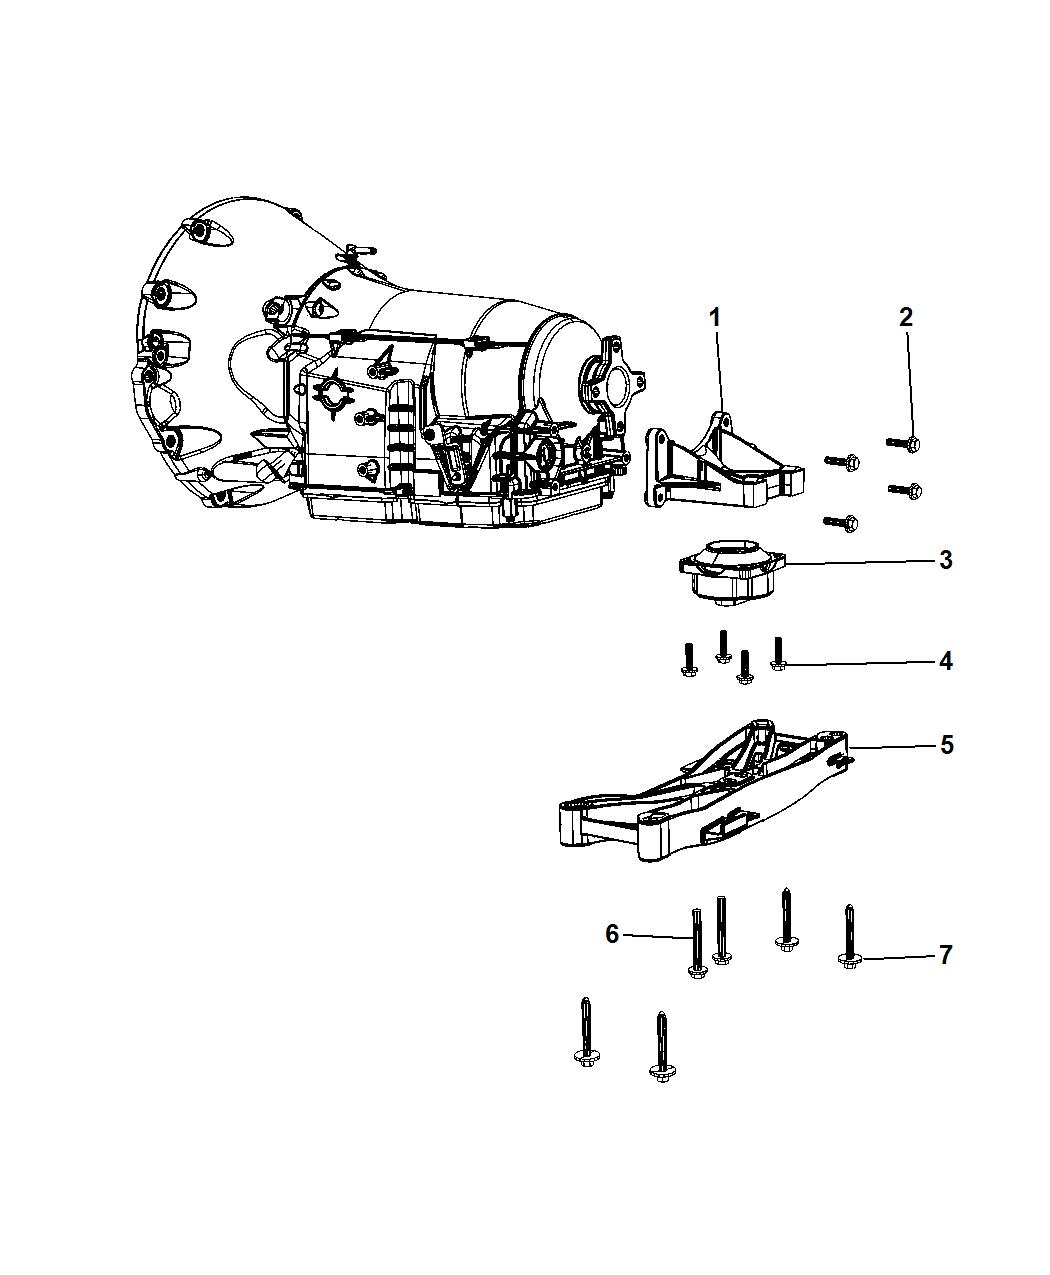 zl_2849] 2010 charger engine diagram free diagram  rdona capem vira mohammedshrine librar wiring 101